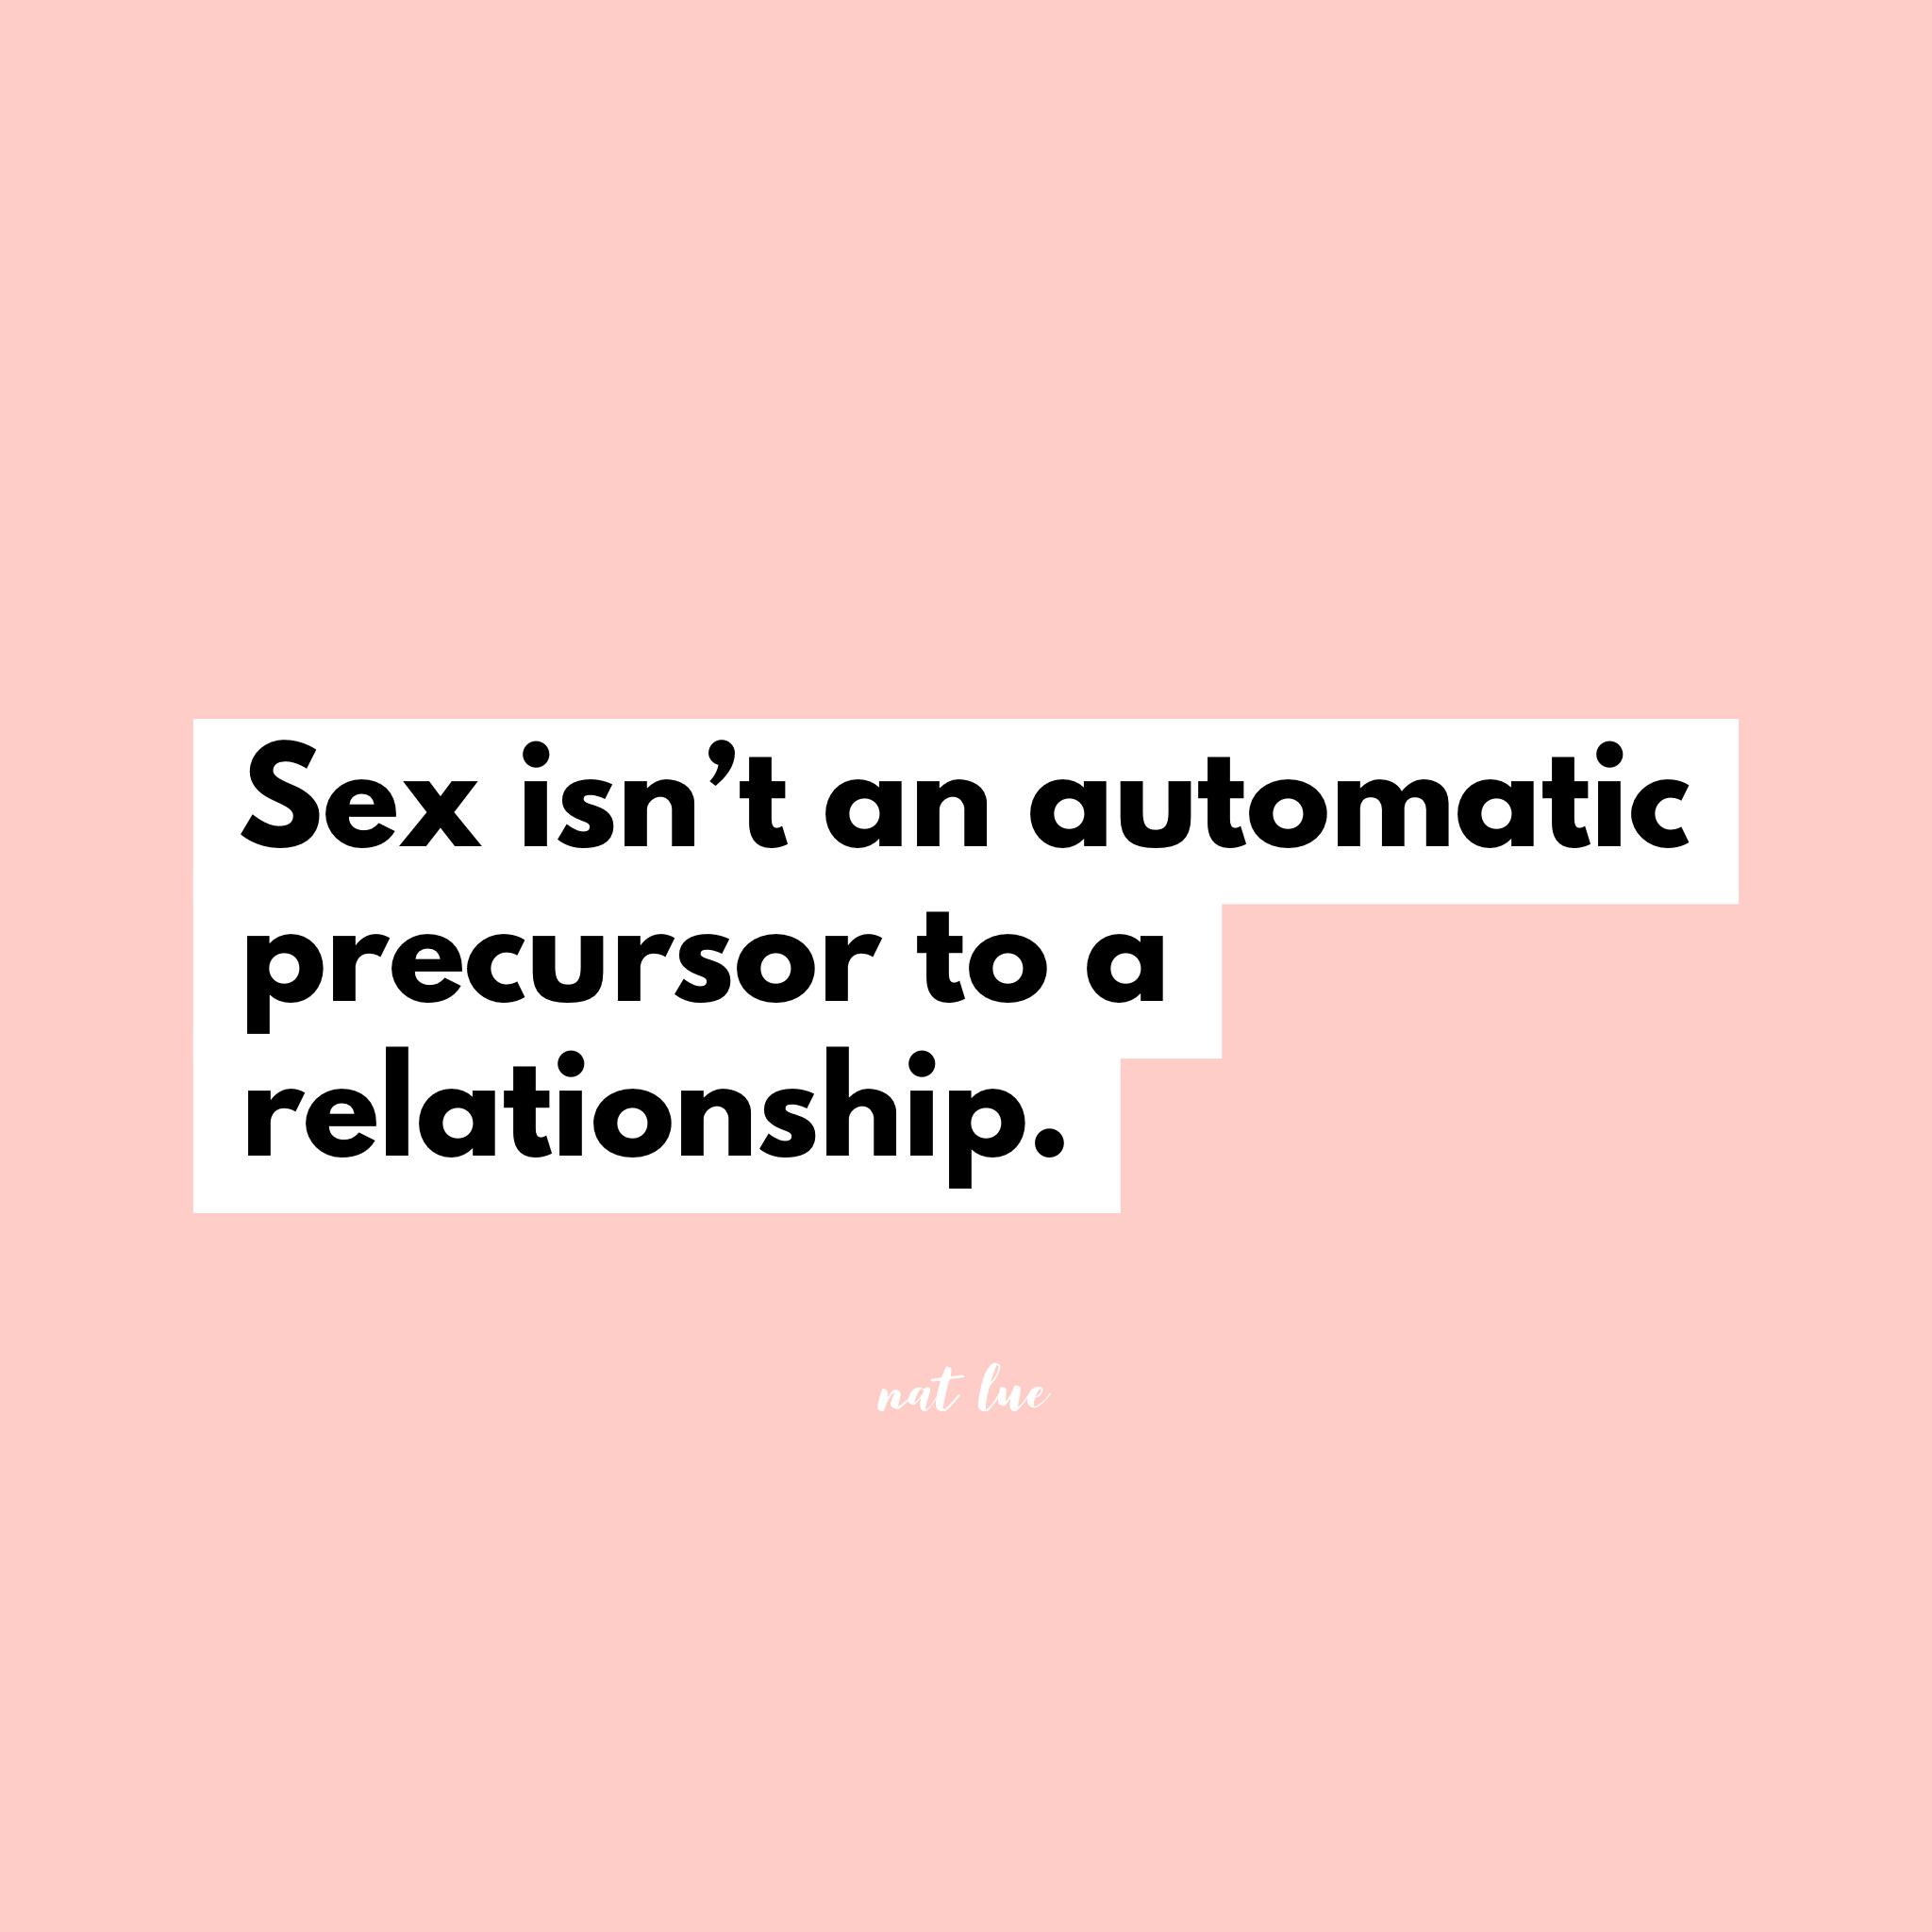 Lightroom free alternative dating